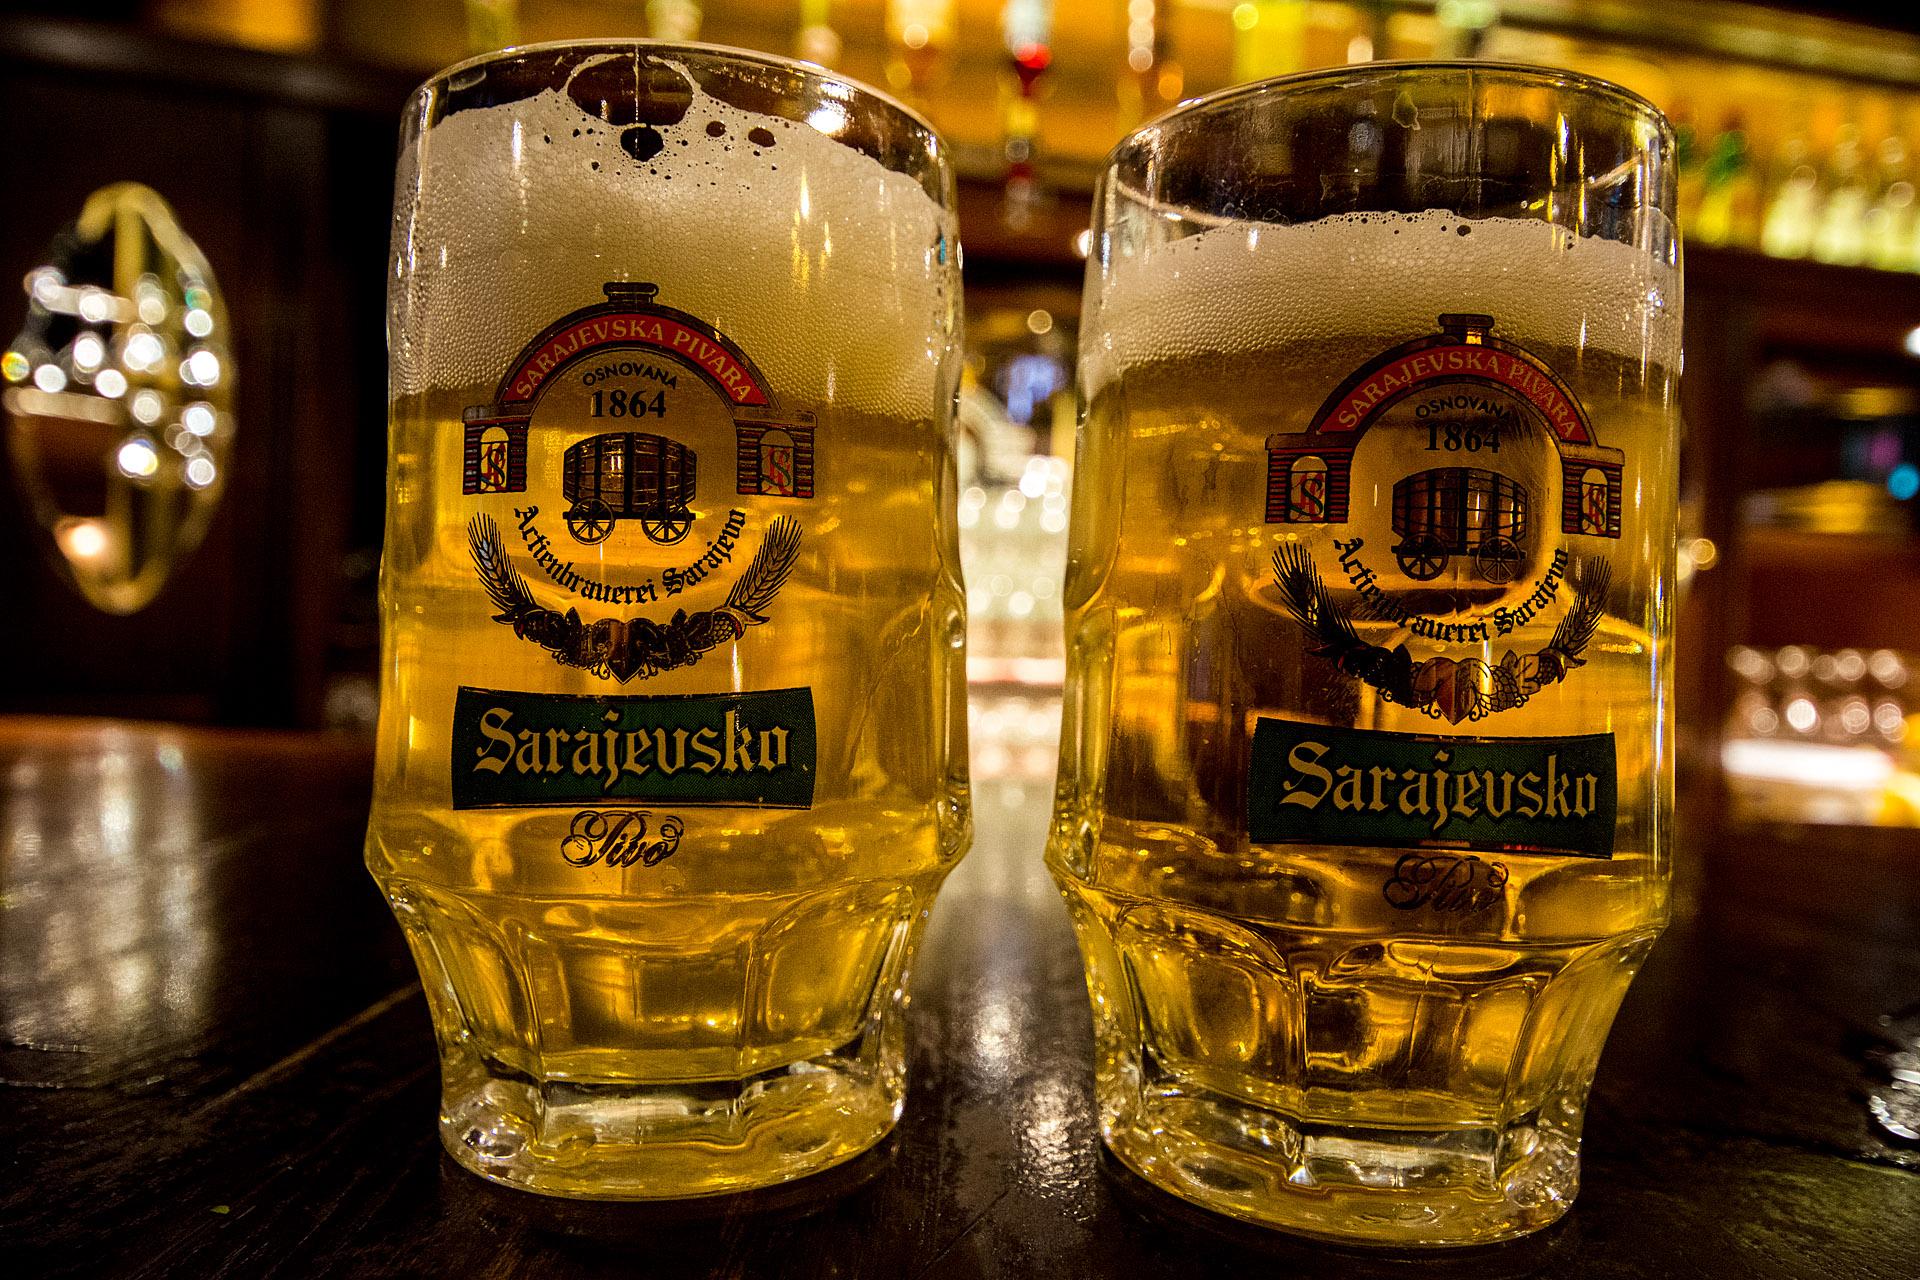 Unfiltered beer & light lager